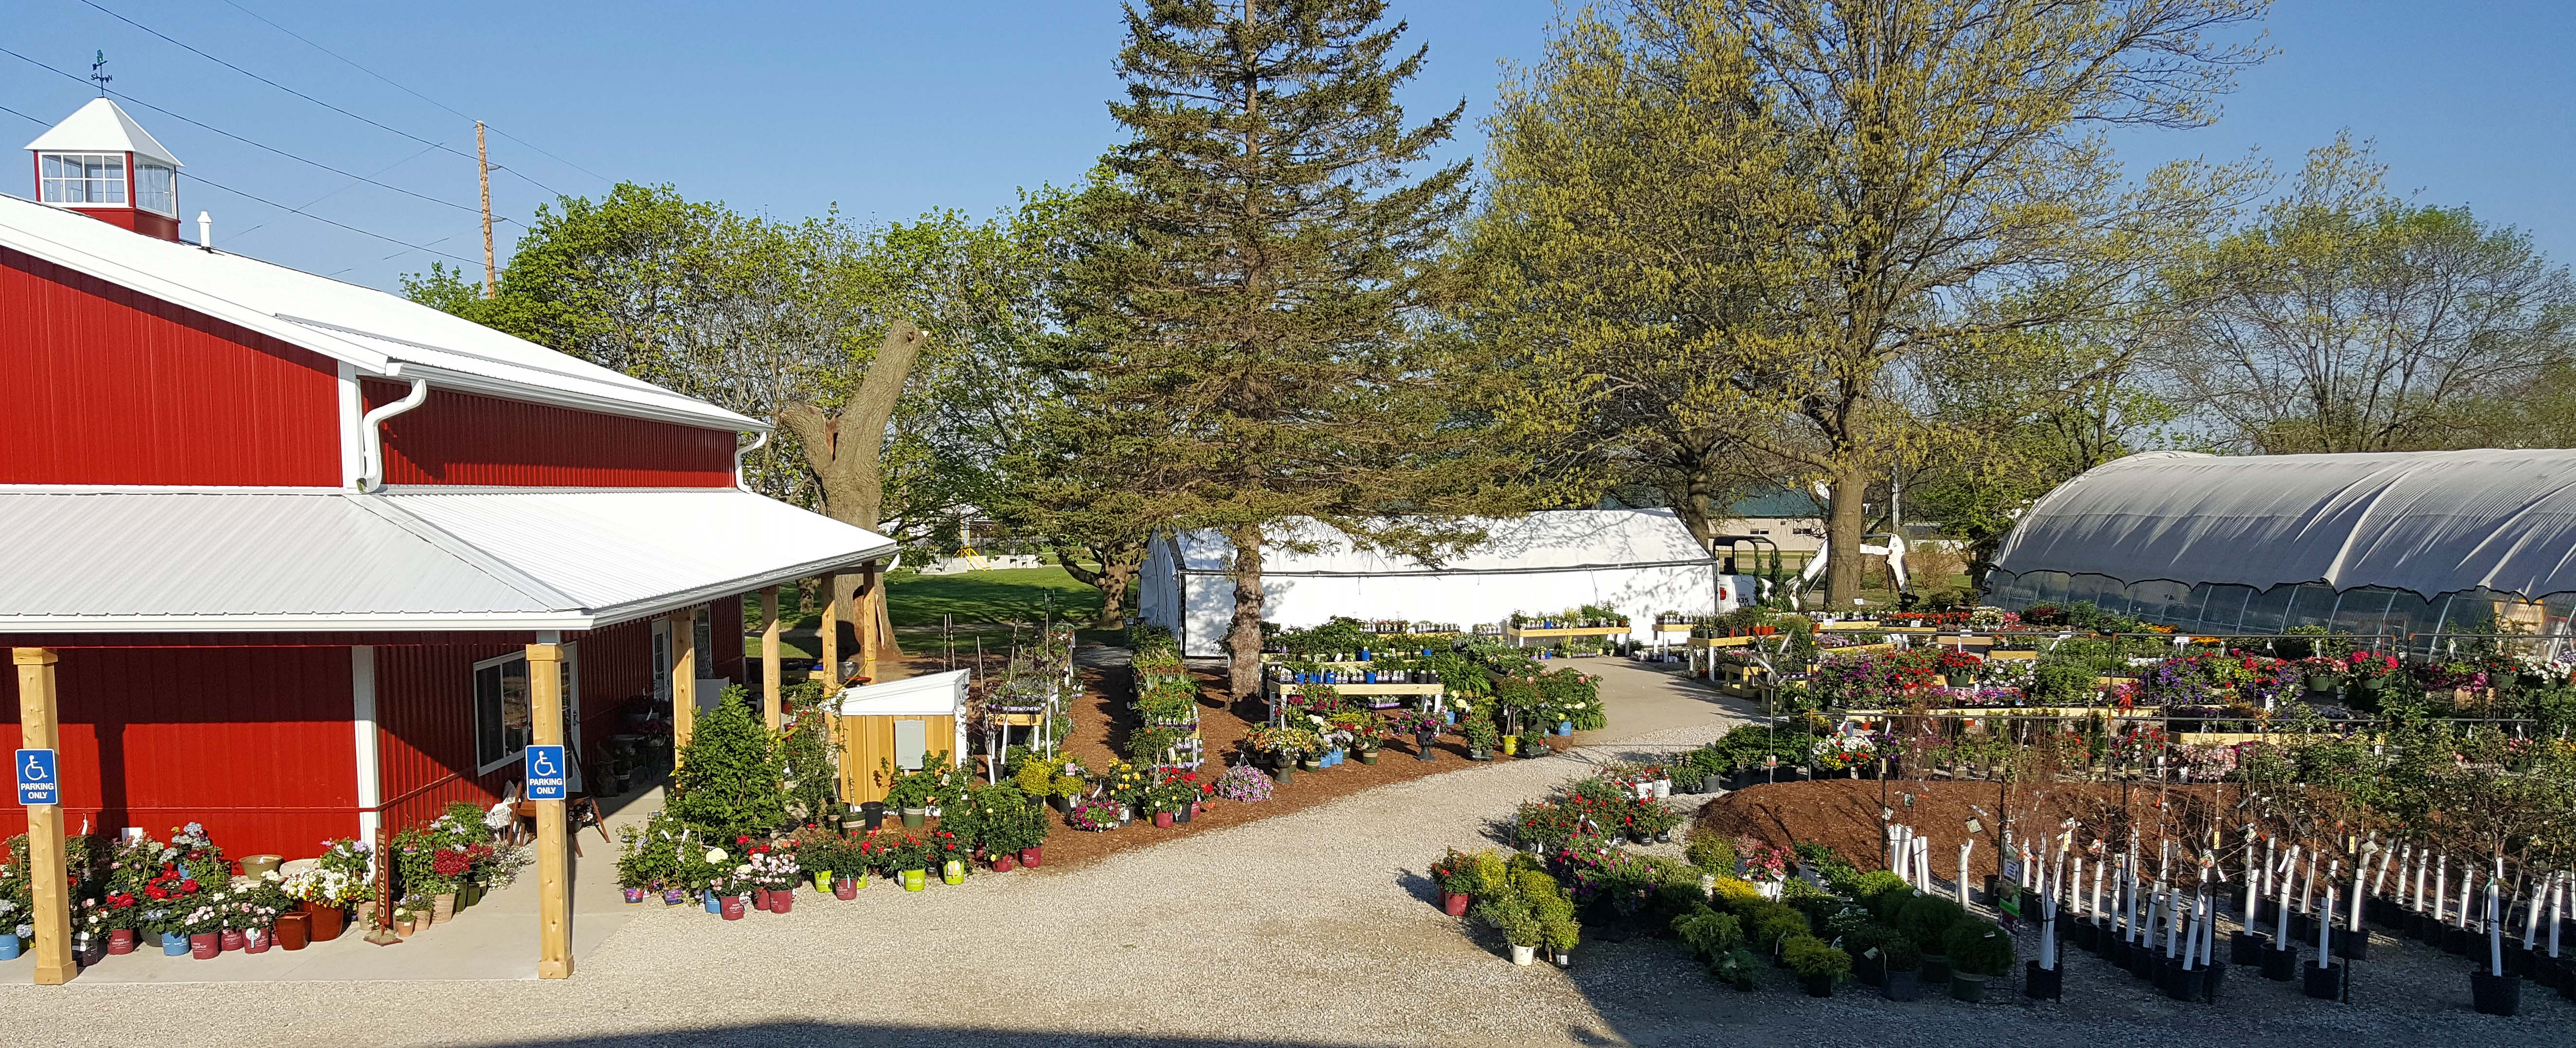 A new garden center nursery for the Cedar Rapids Marion area